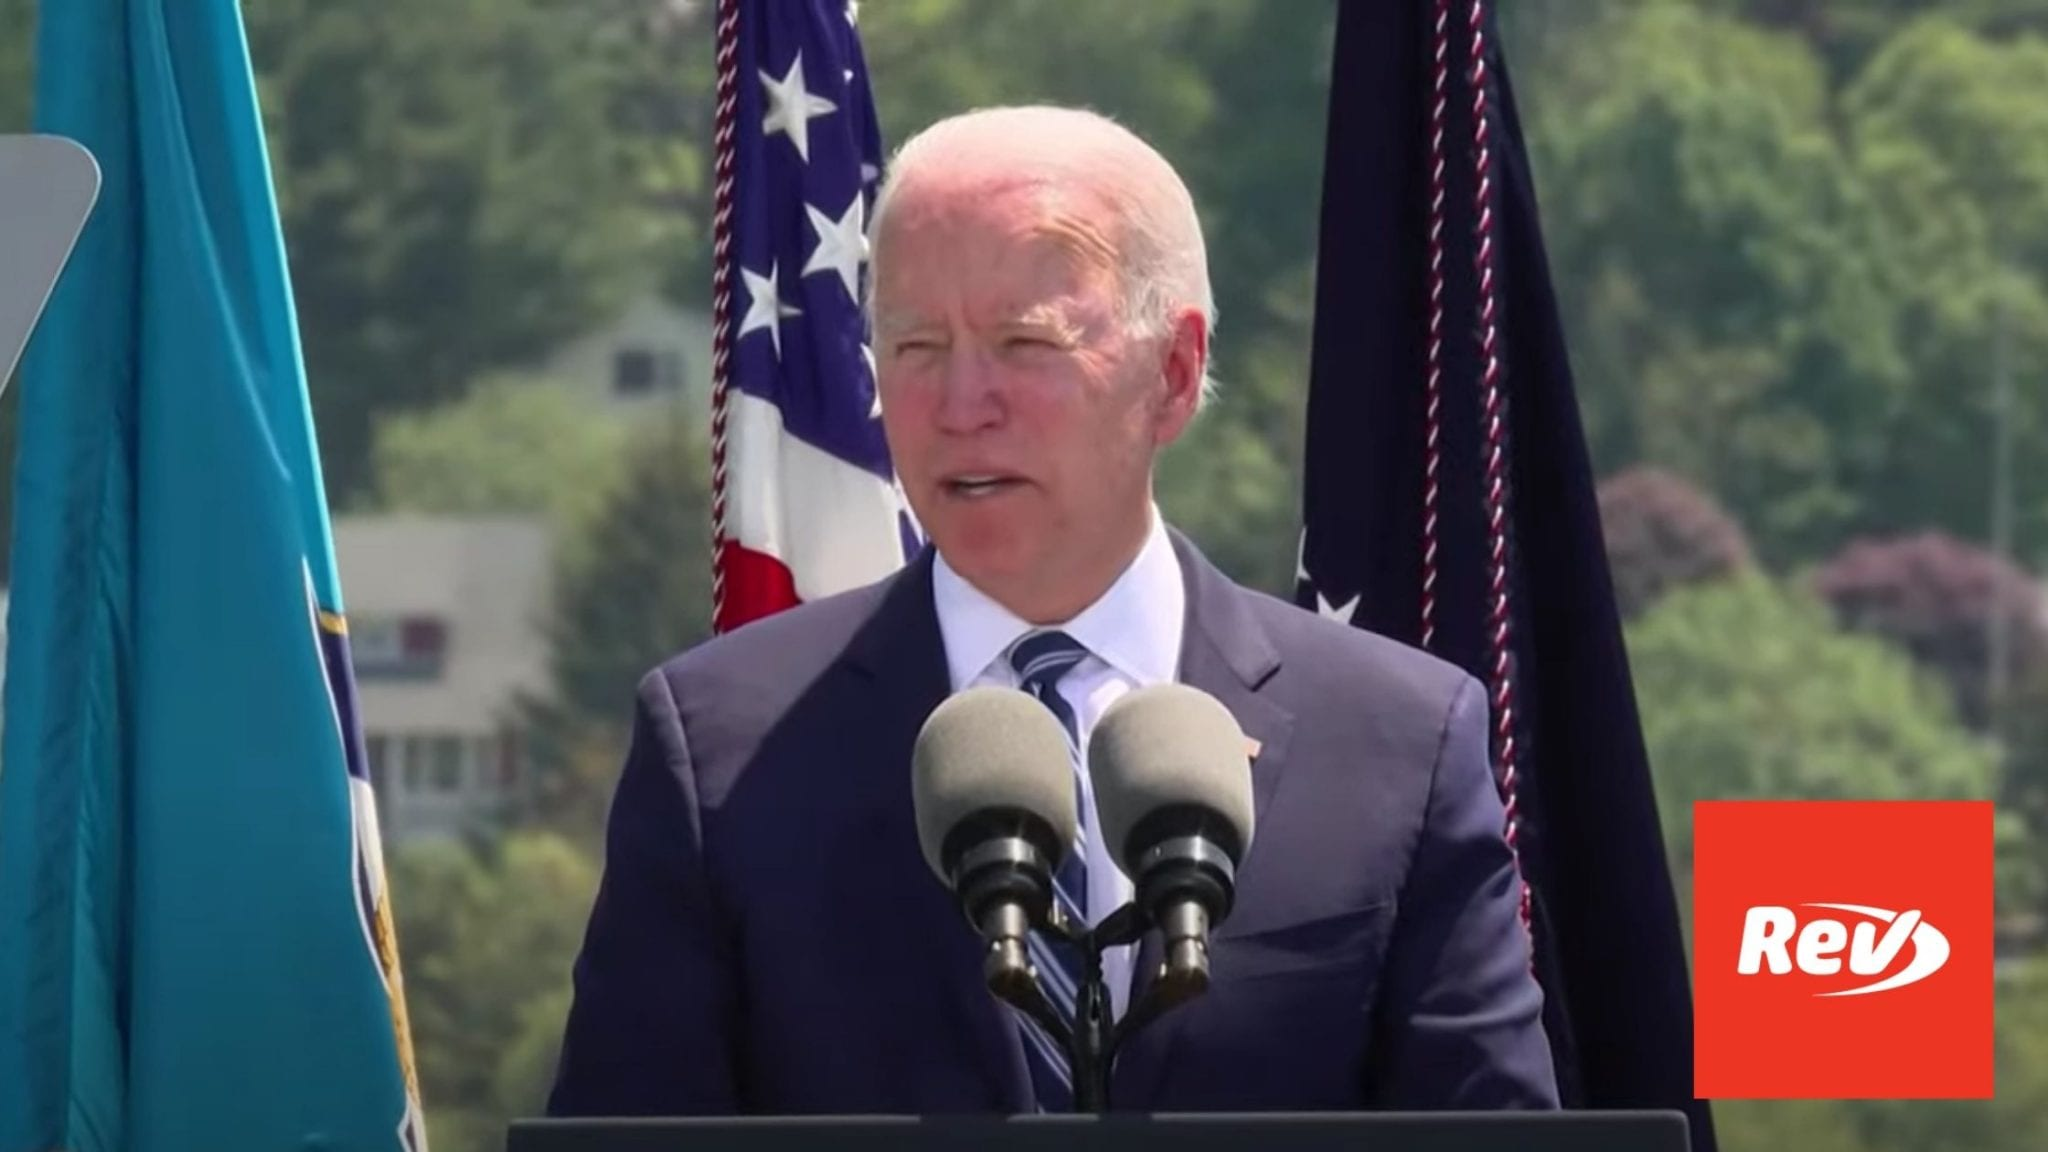 Joe Biden Coast Guard Keynote Address Speech Transcript May 19